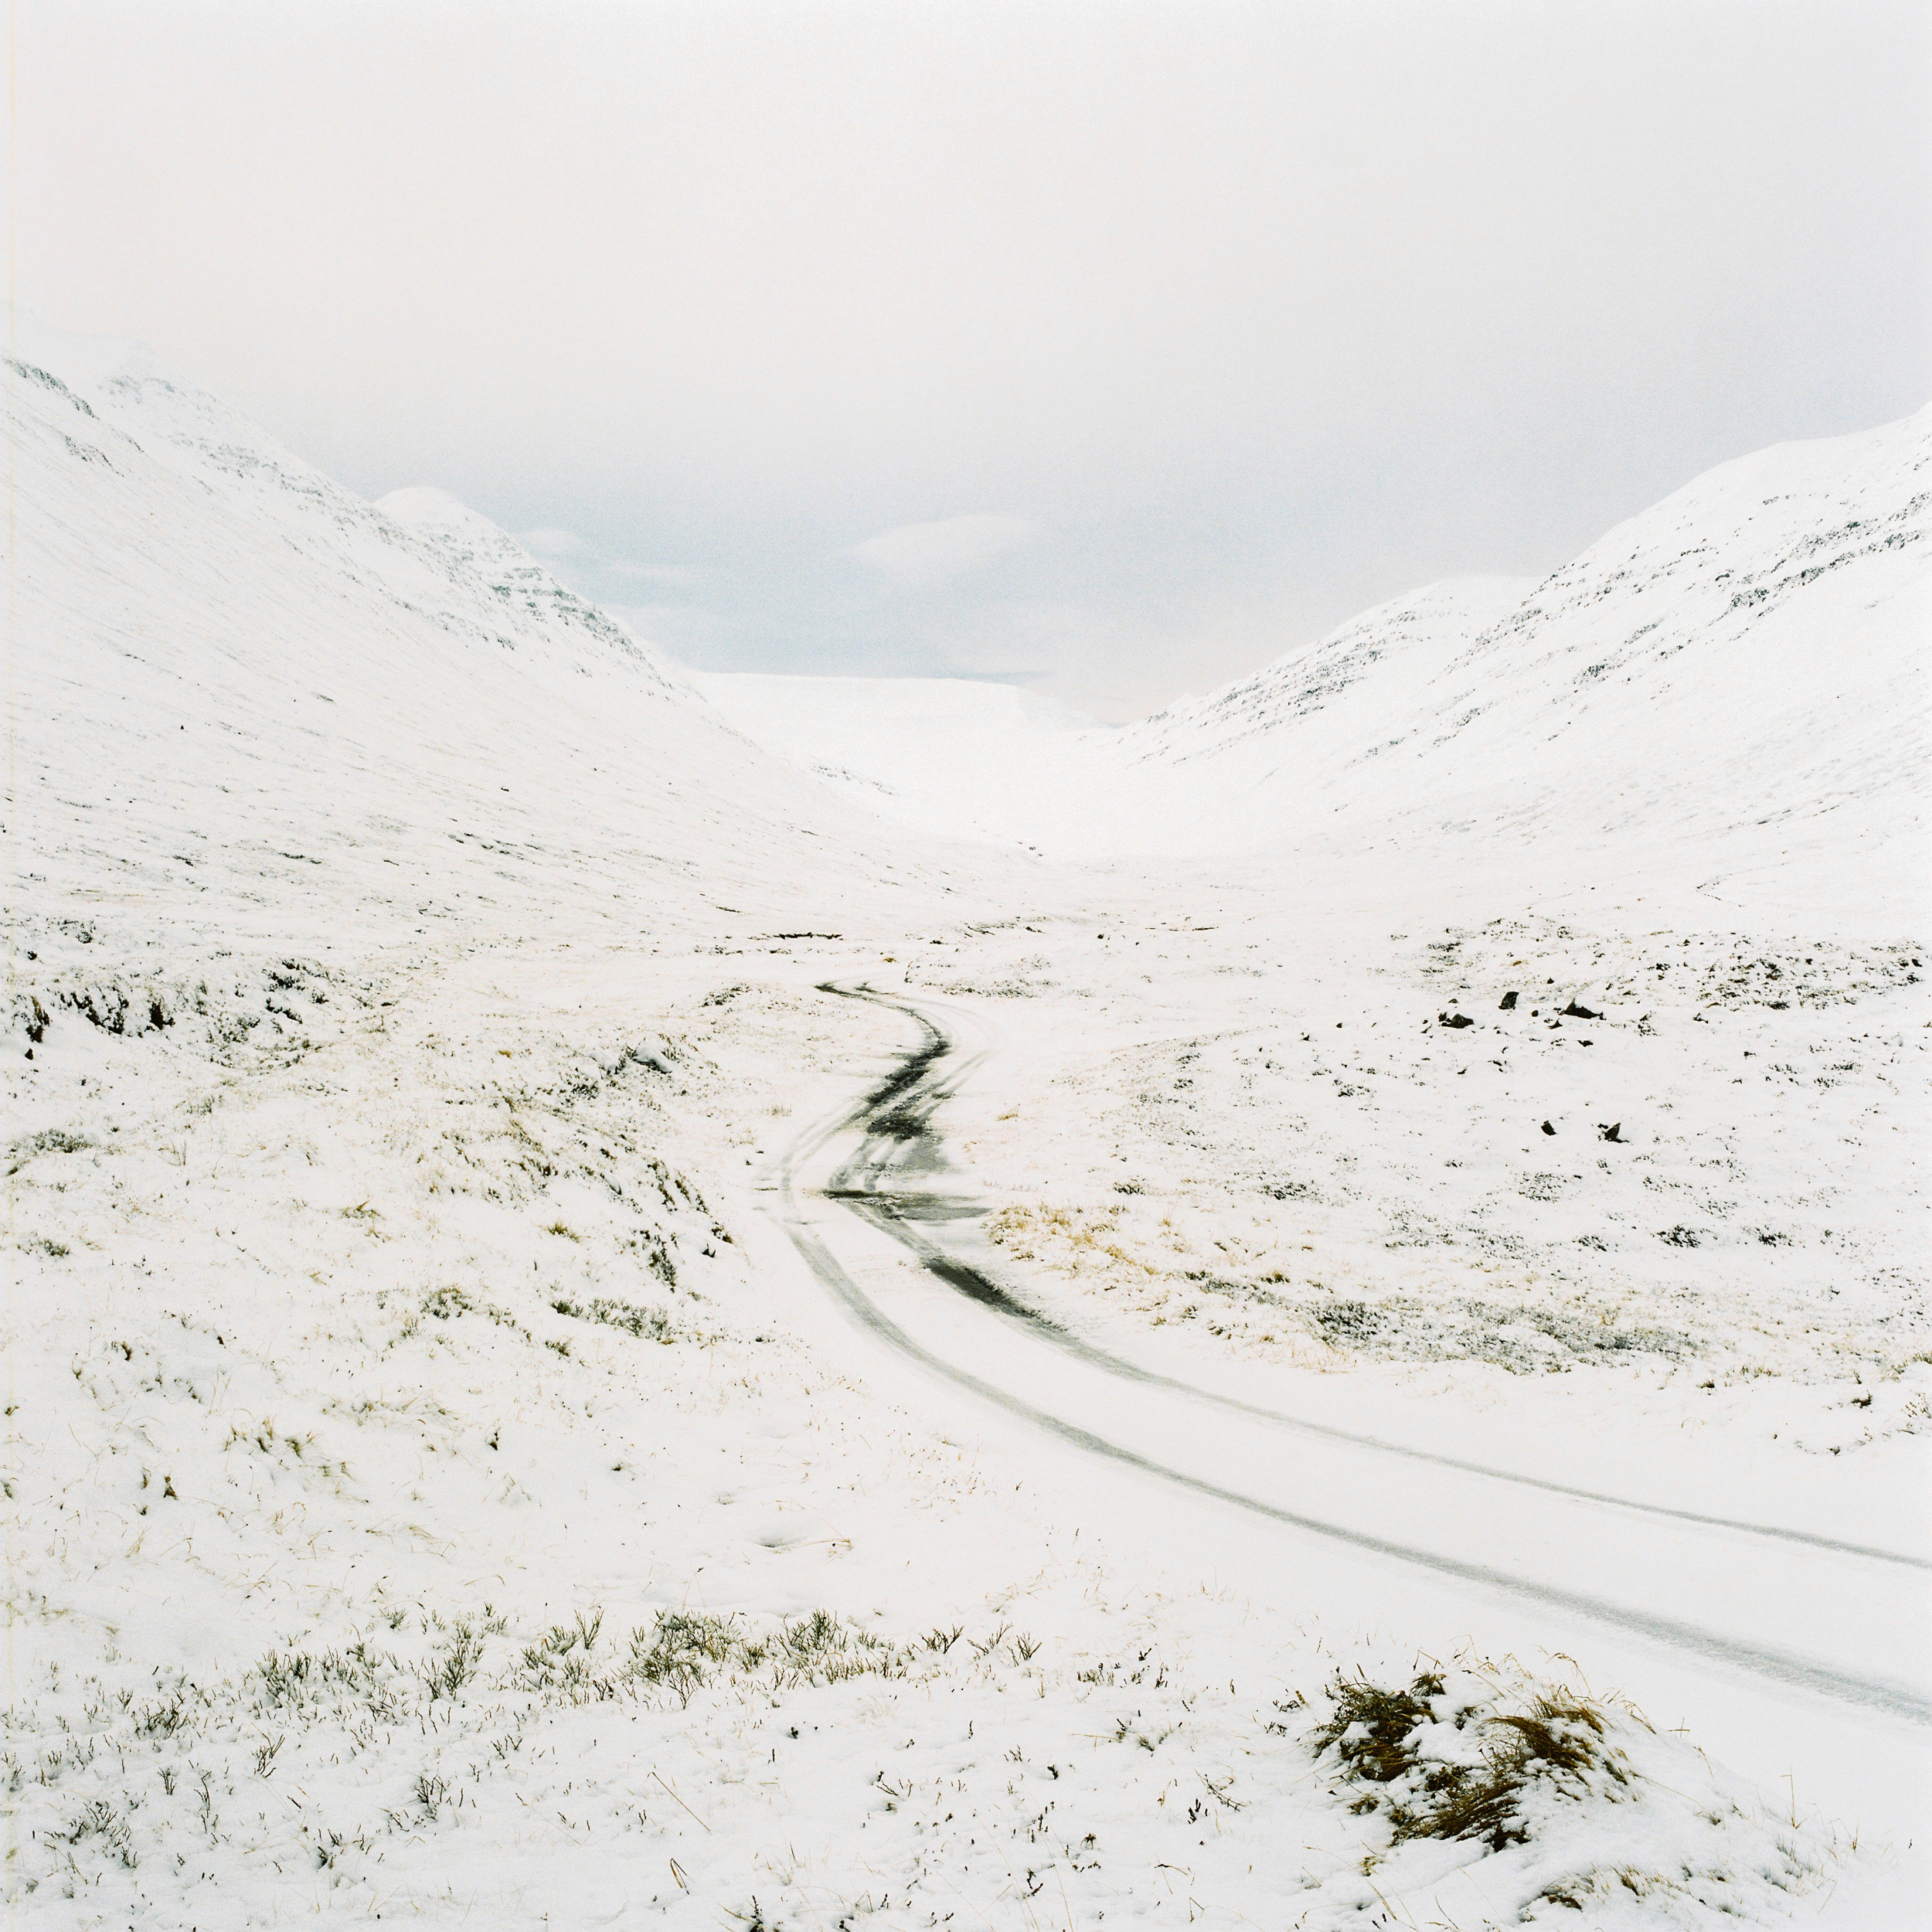 Iceland-Snow-4.jpg